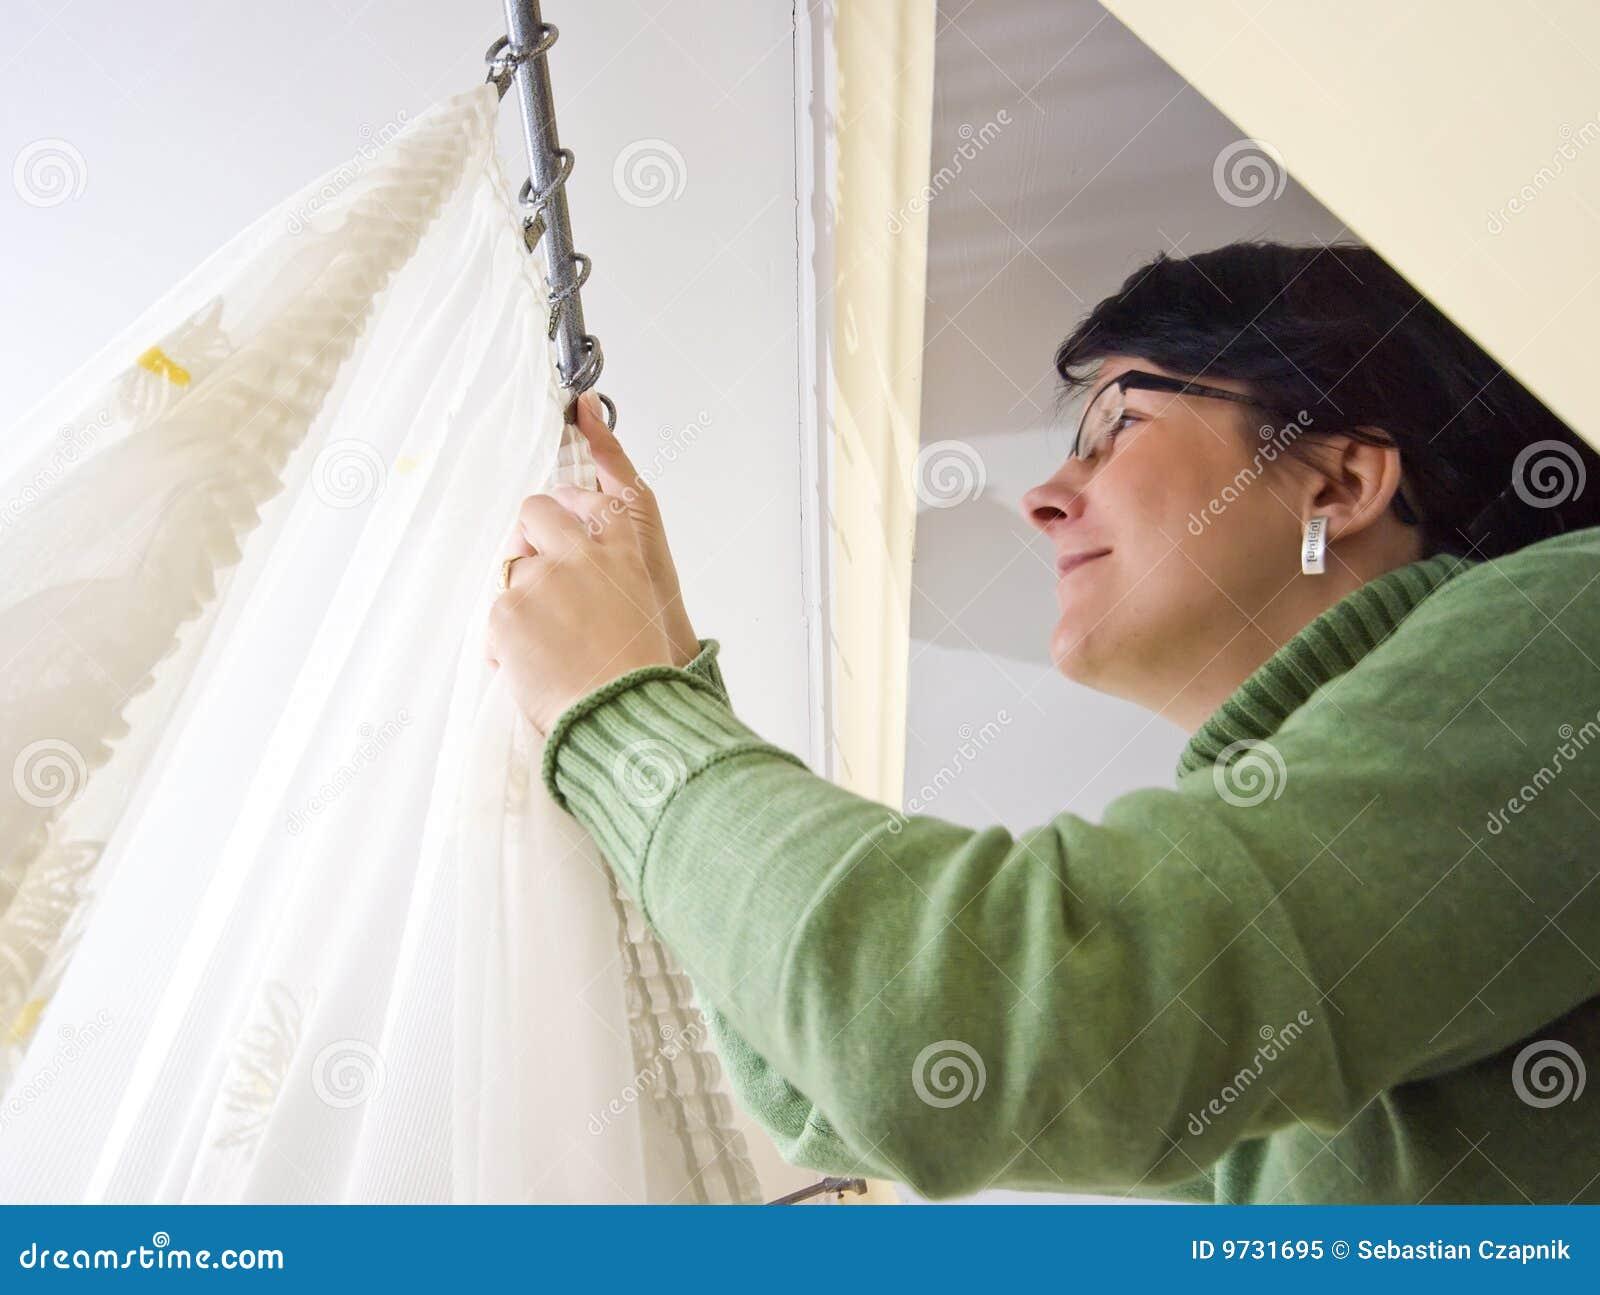 Hangende netto gordijnen